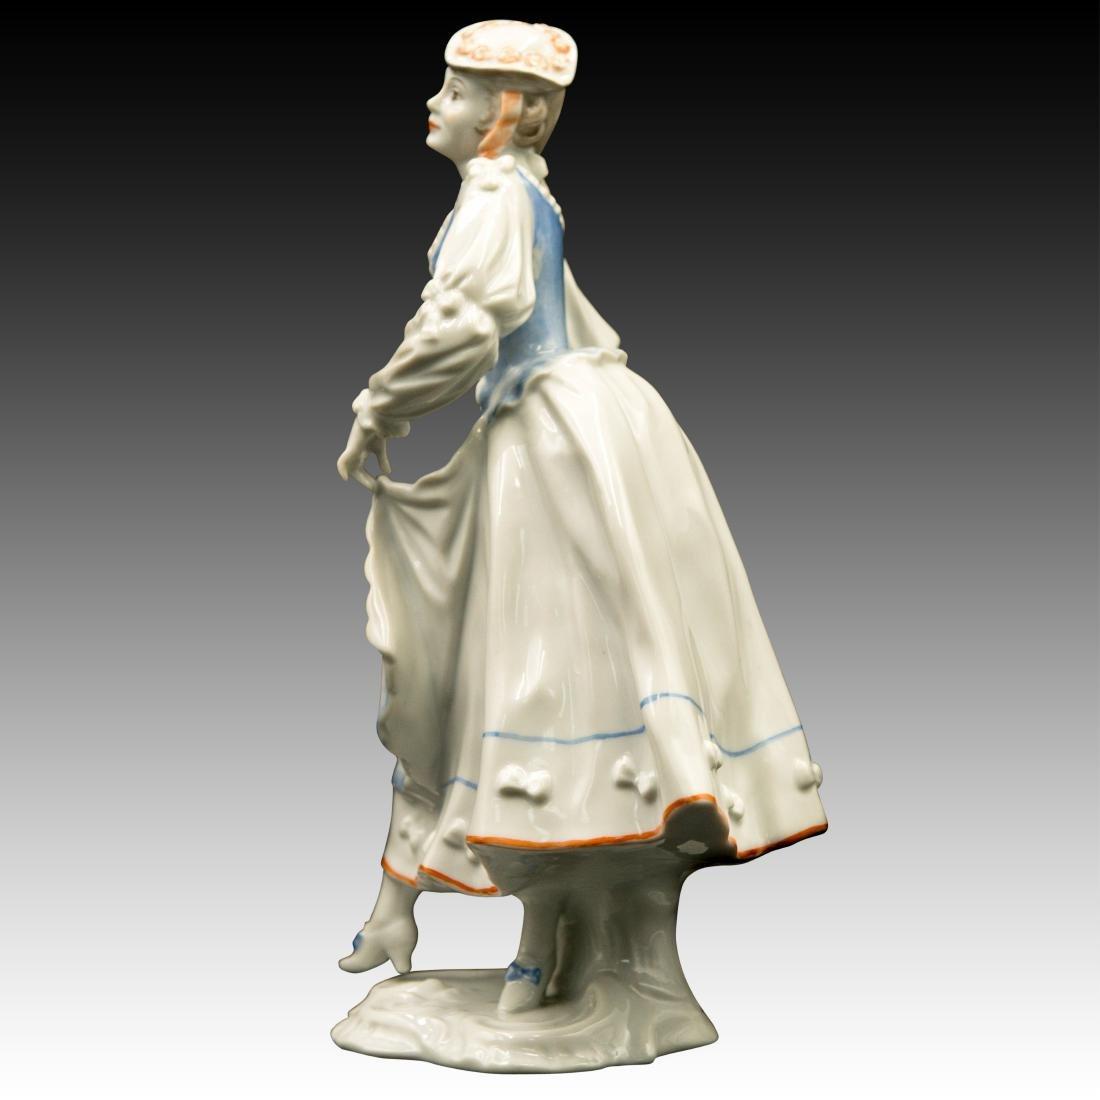 Rosenthal Rococo Lady Dancer Figurine - 4